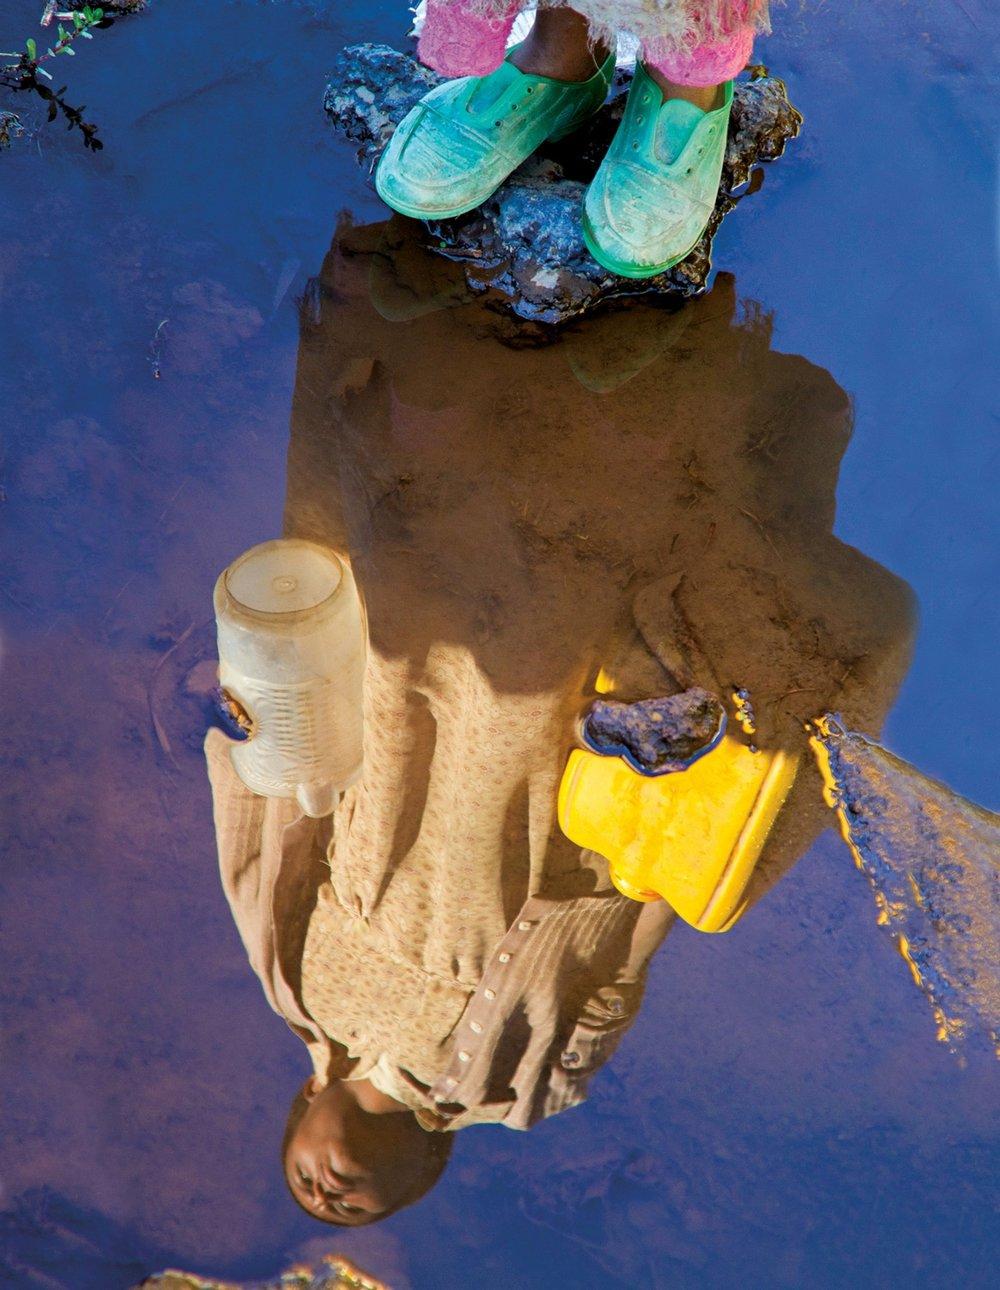 ethiopia-water-jerrycan.jpg